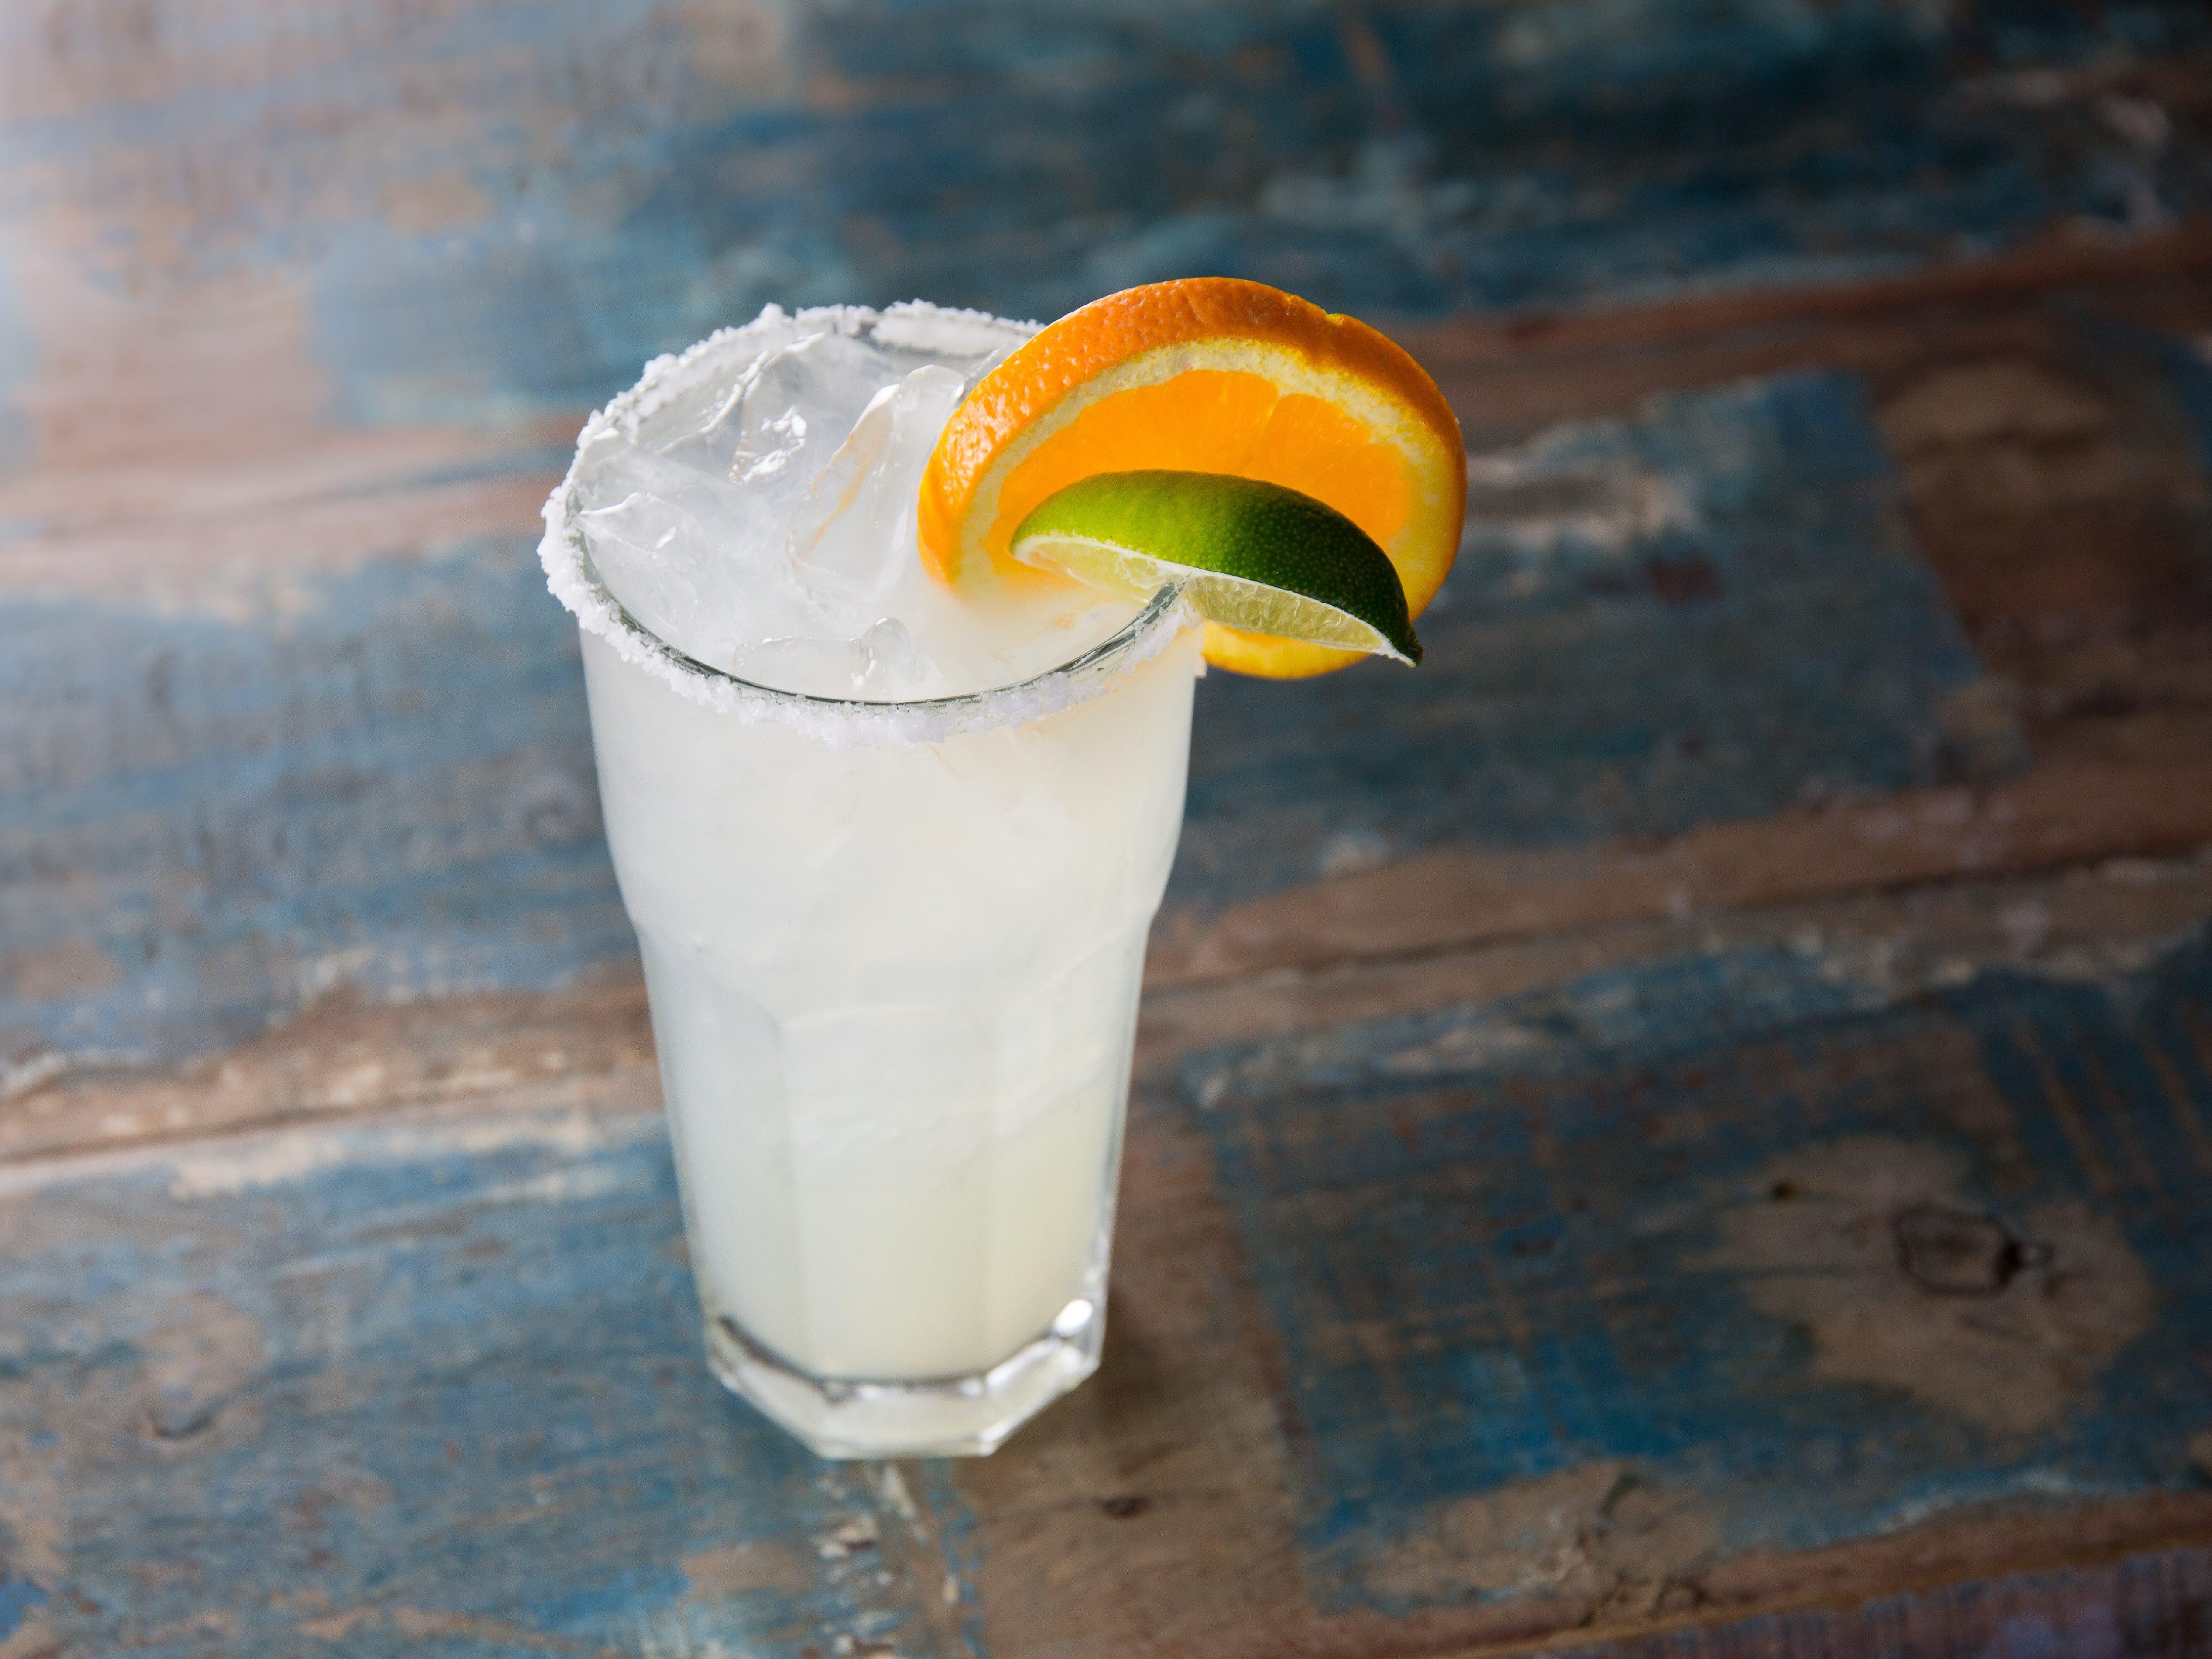 The Fresh Squeezed Margarita at Sierra Bonita Grill.